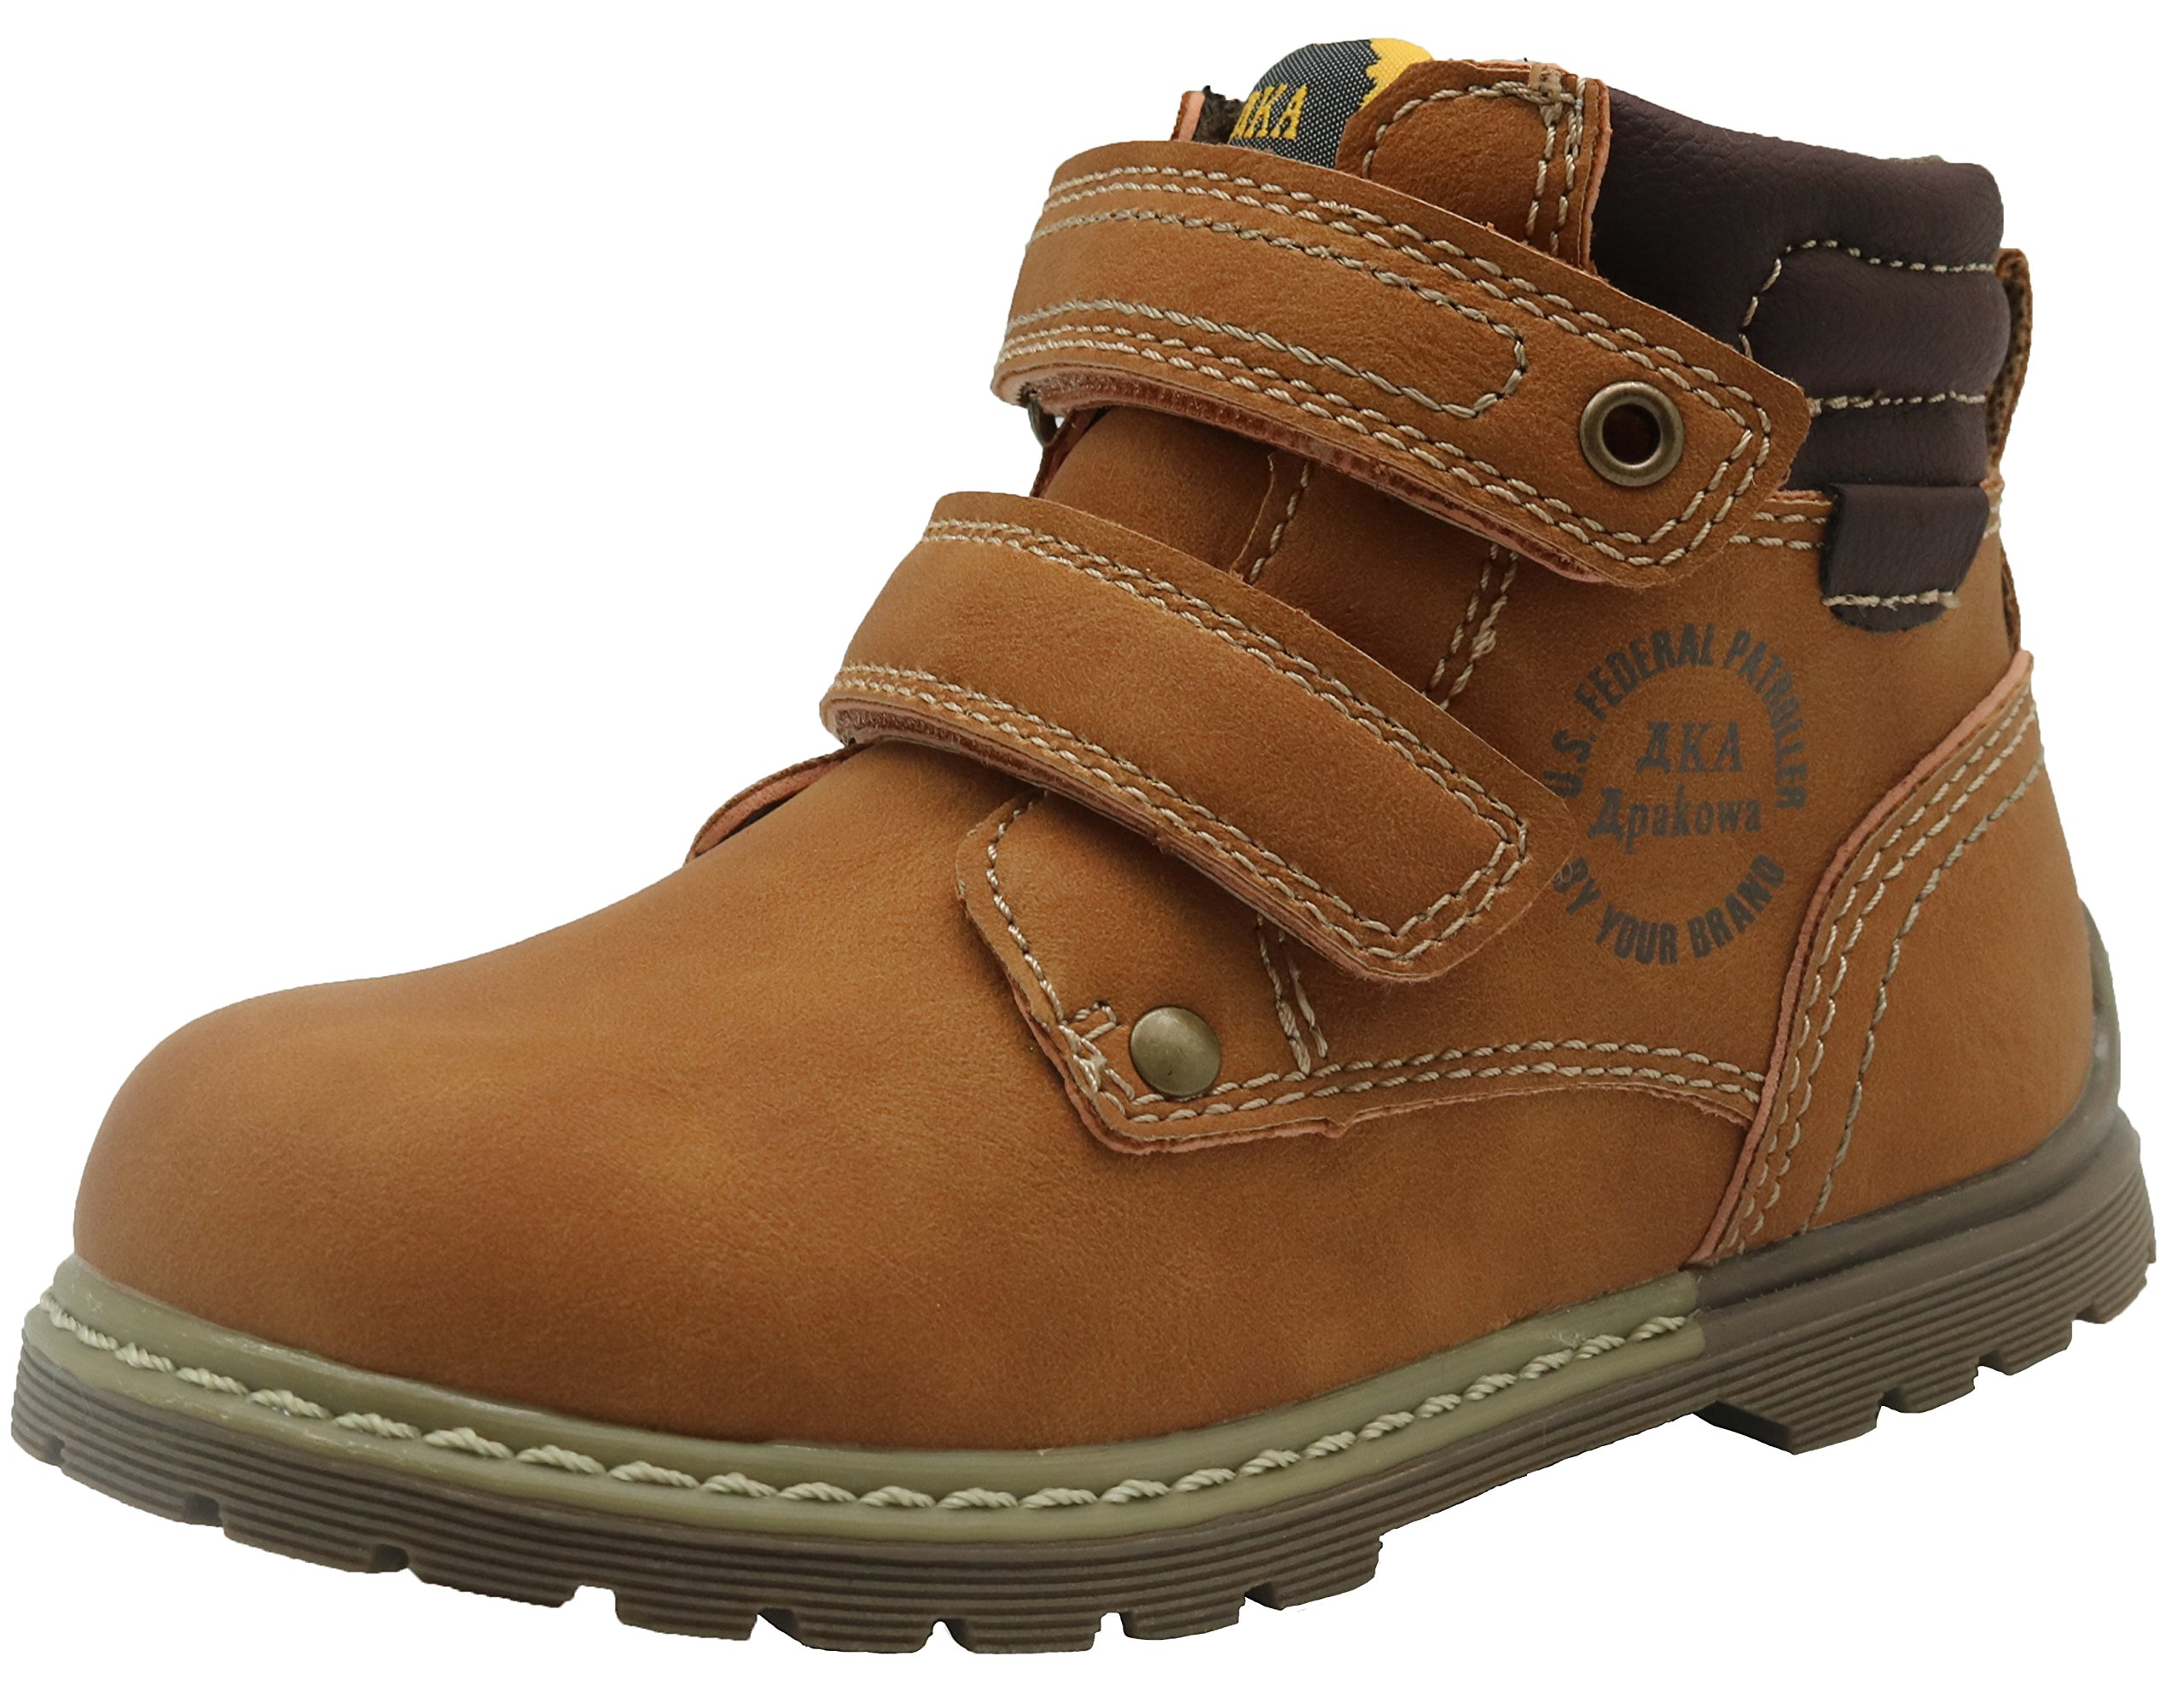 Apakowa Boy's Classic Rubber Martin Boots (Toddler)